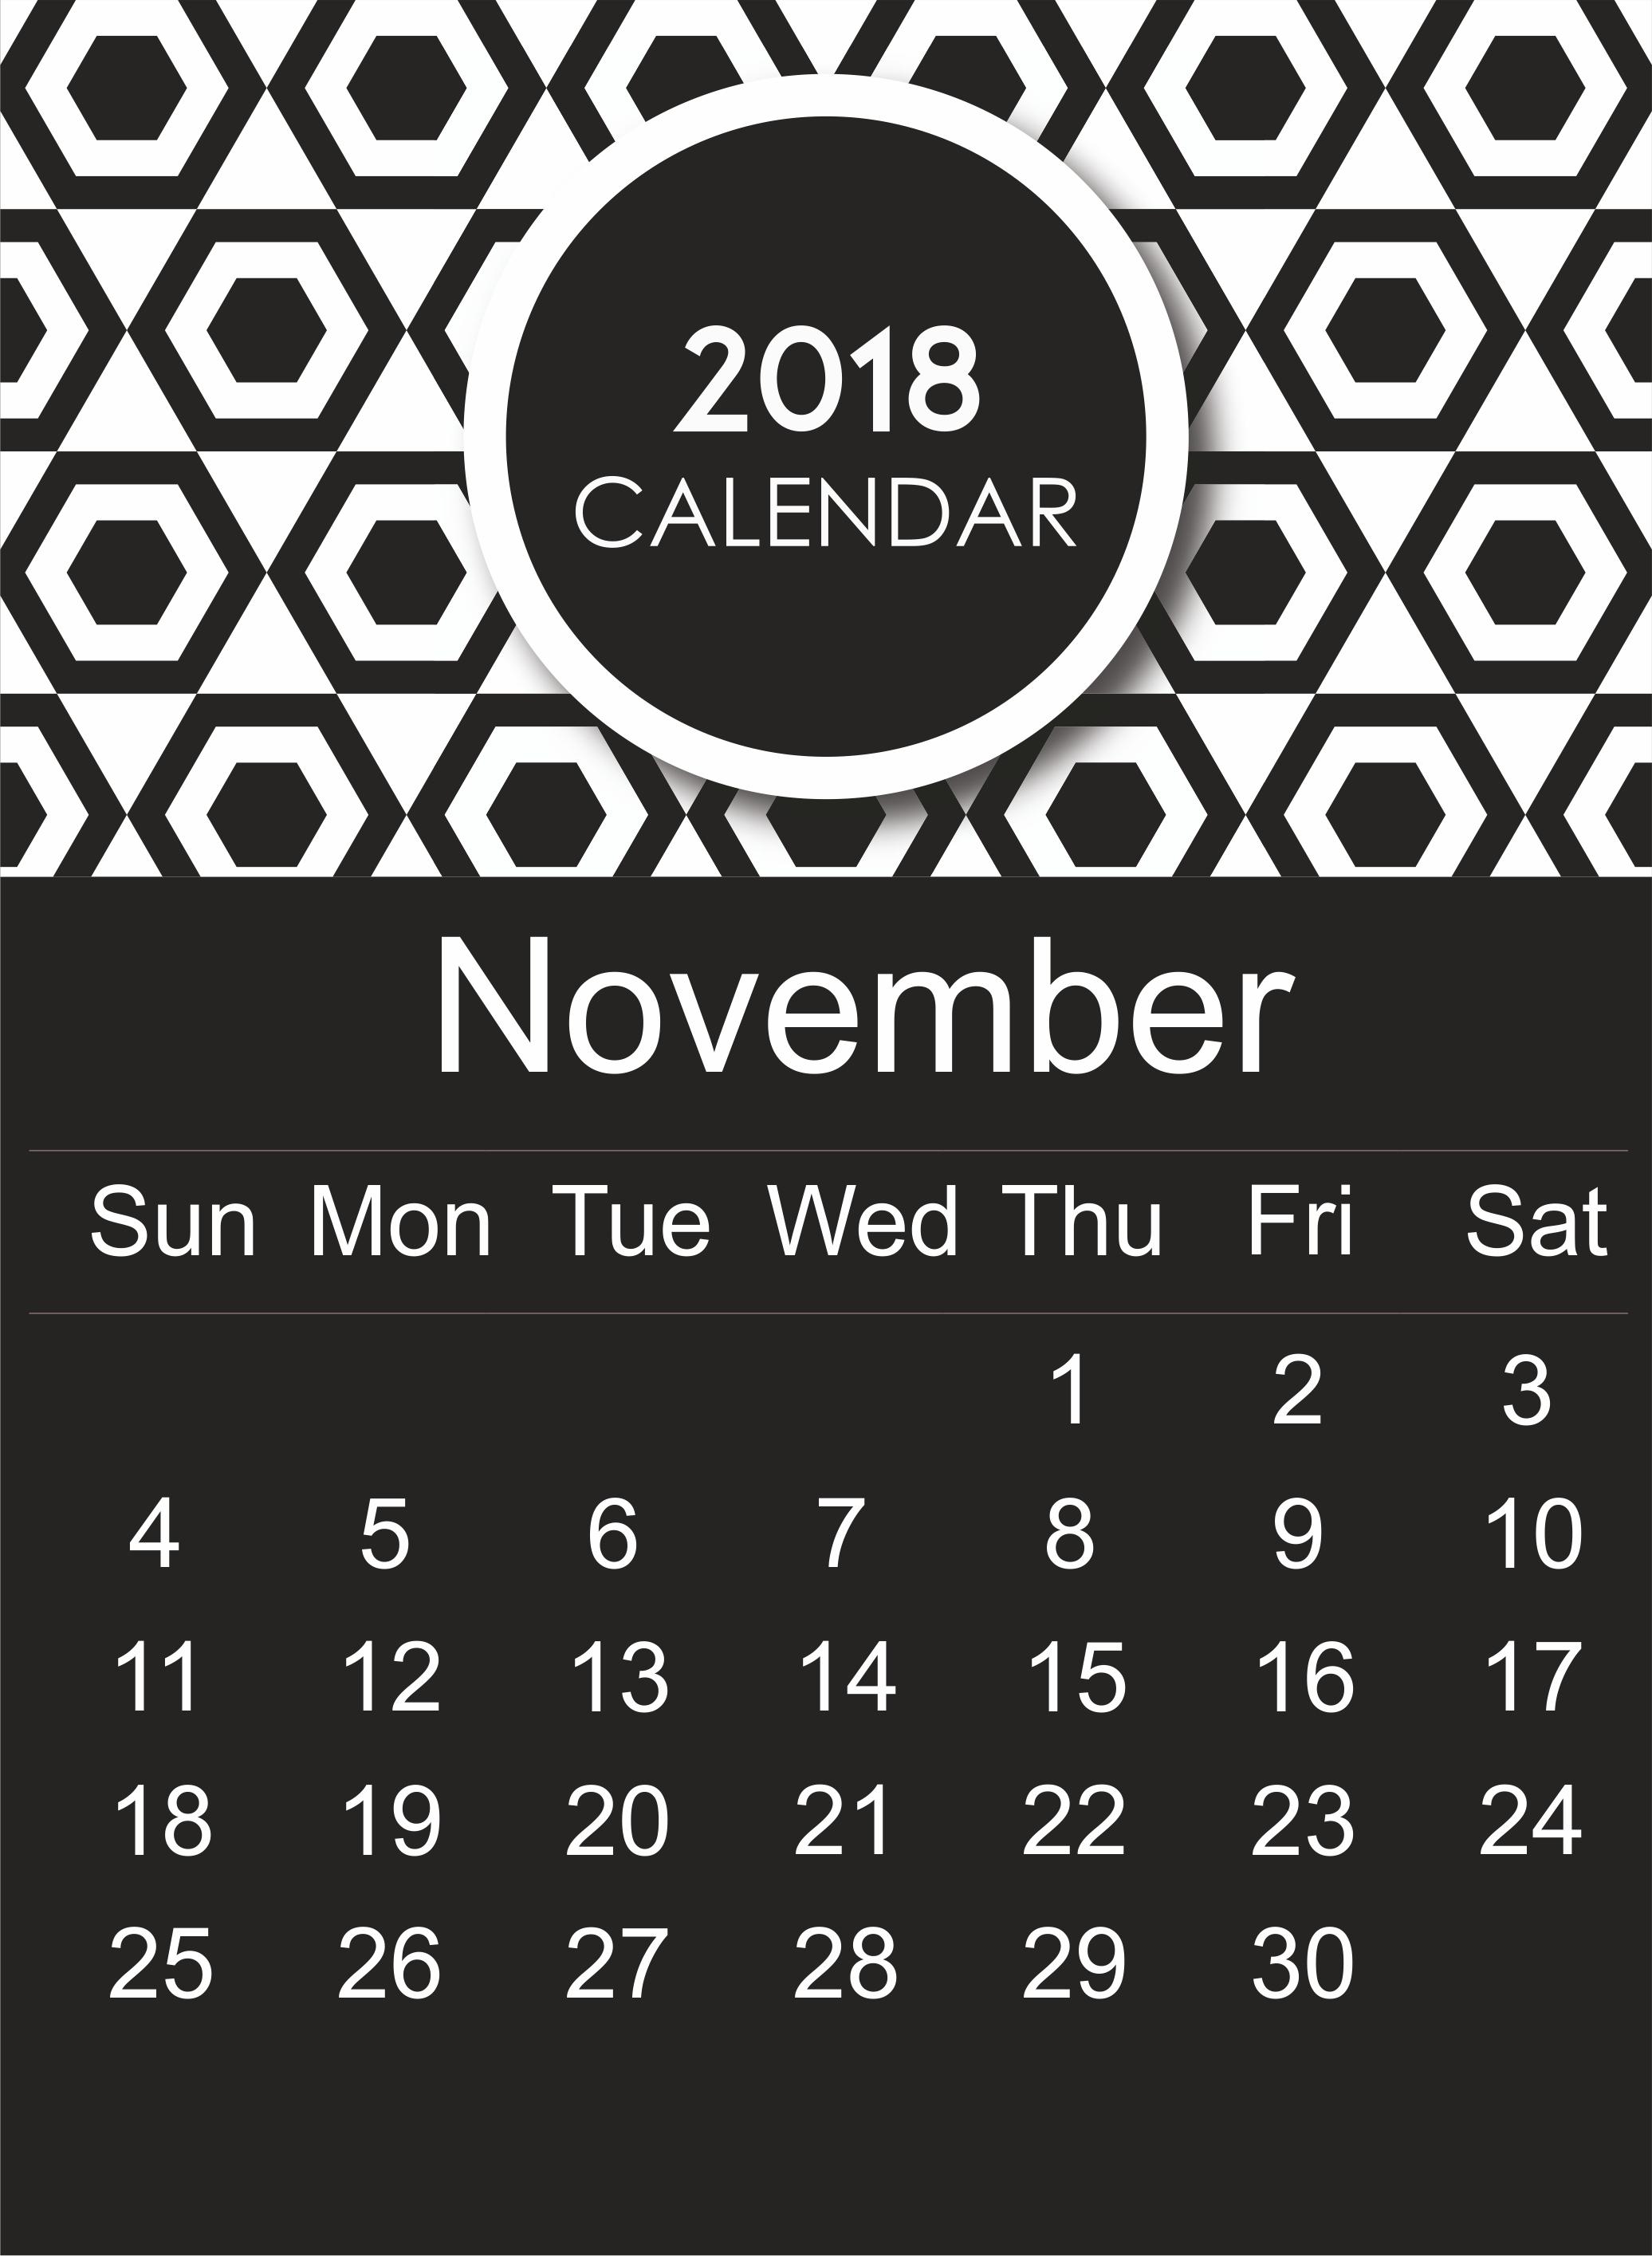 November 2018 Calendar Page Printable